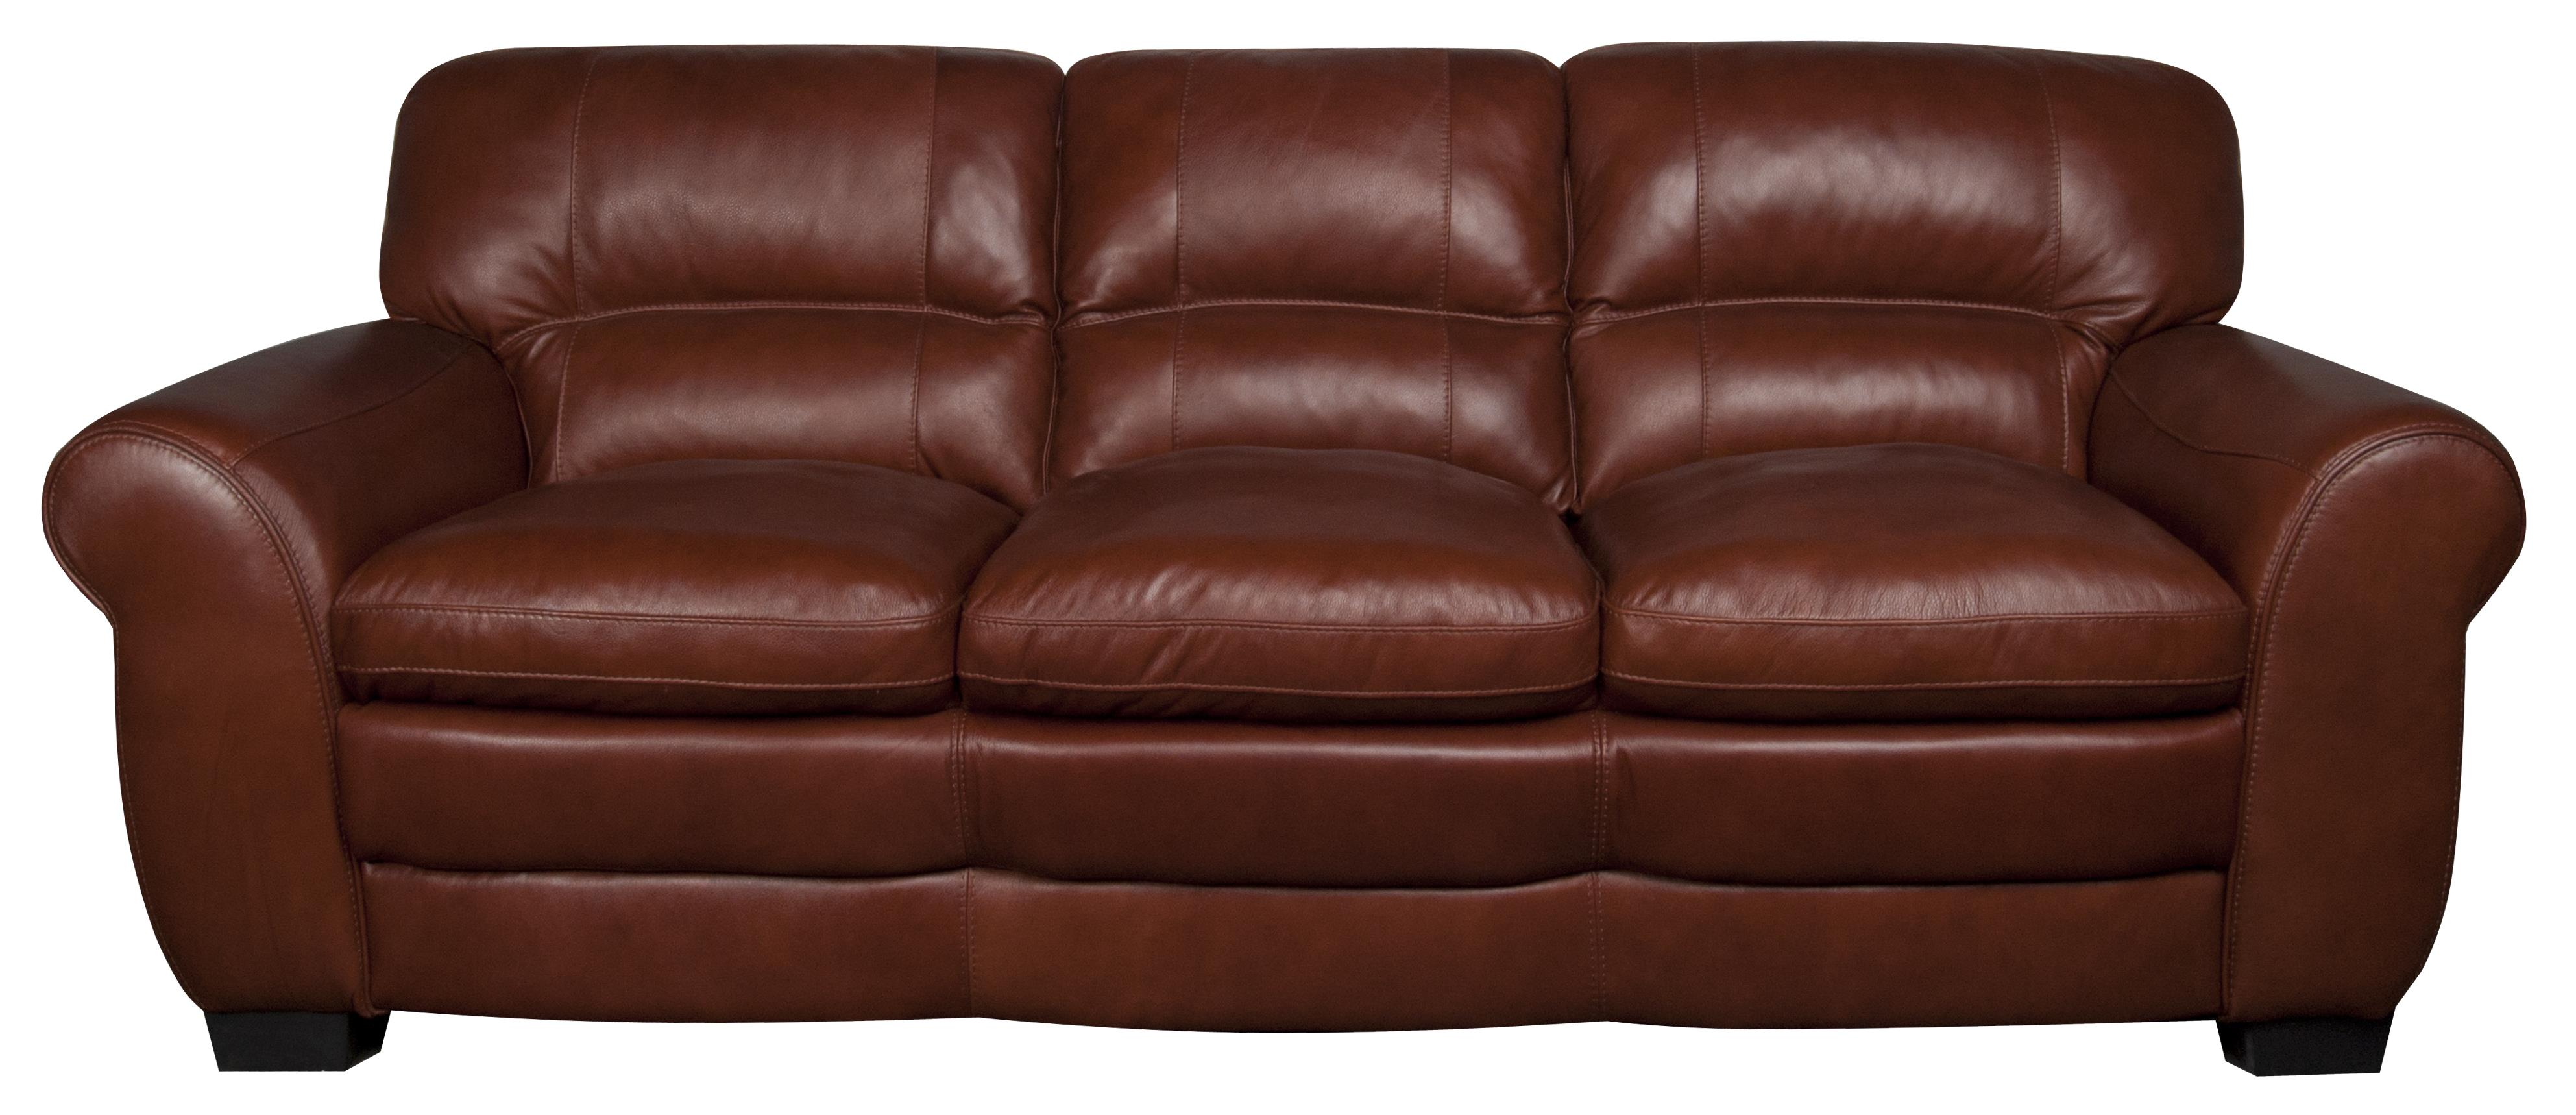 Morris Home Furnishings Ellis Ellis 100% Leather Sofa - Item Number: 846234590